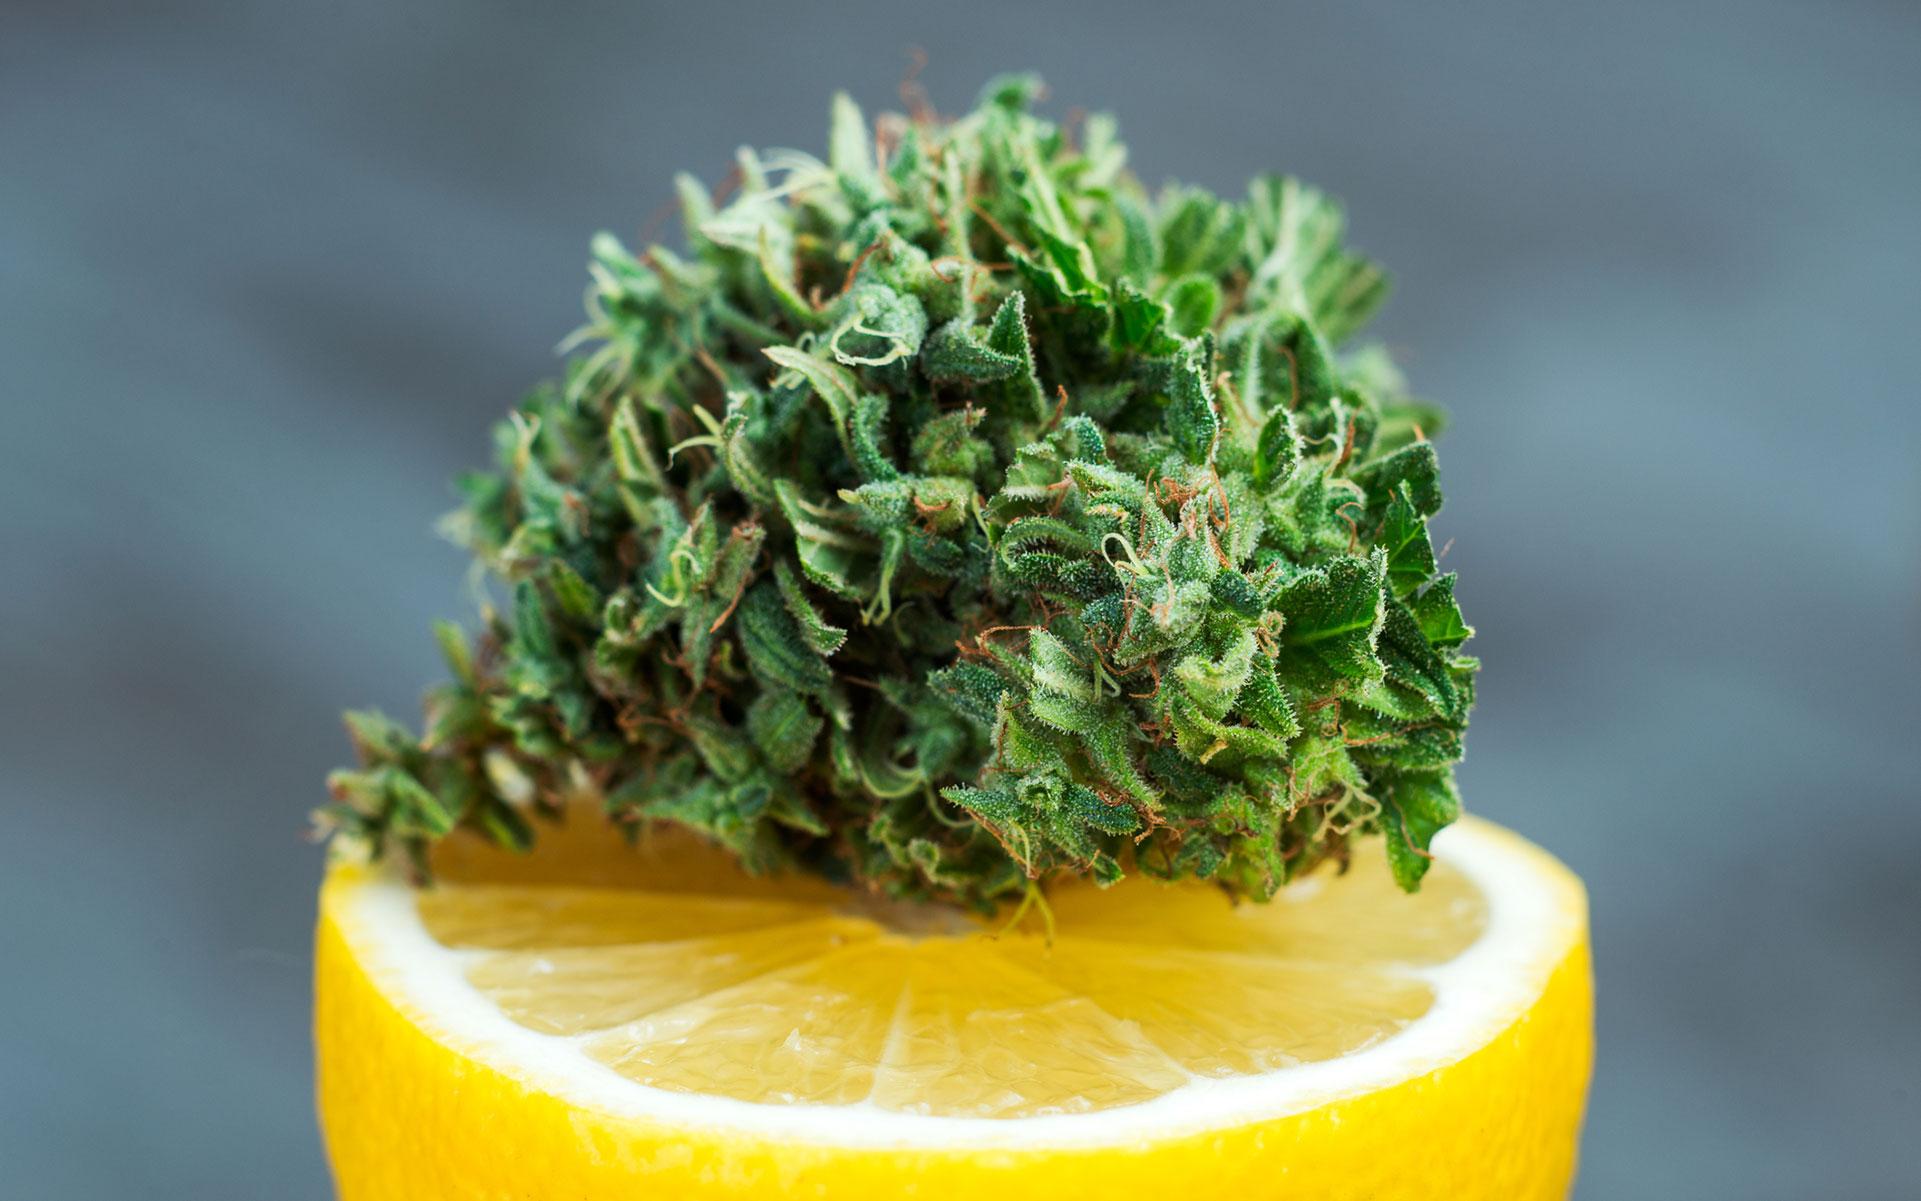 Strains high in limonene